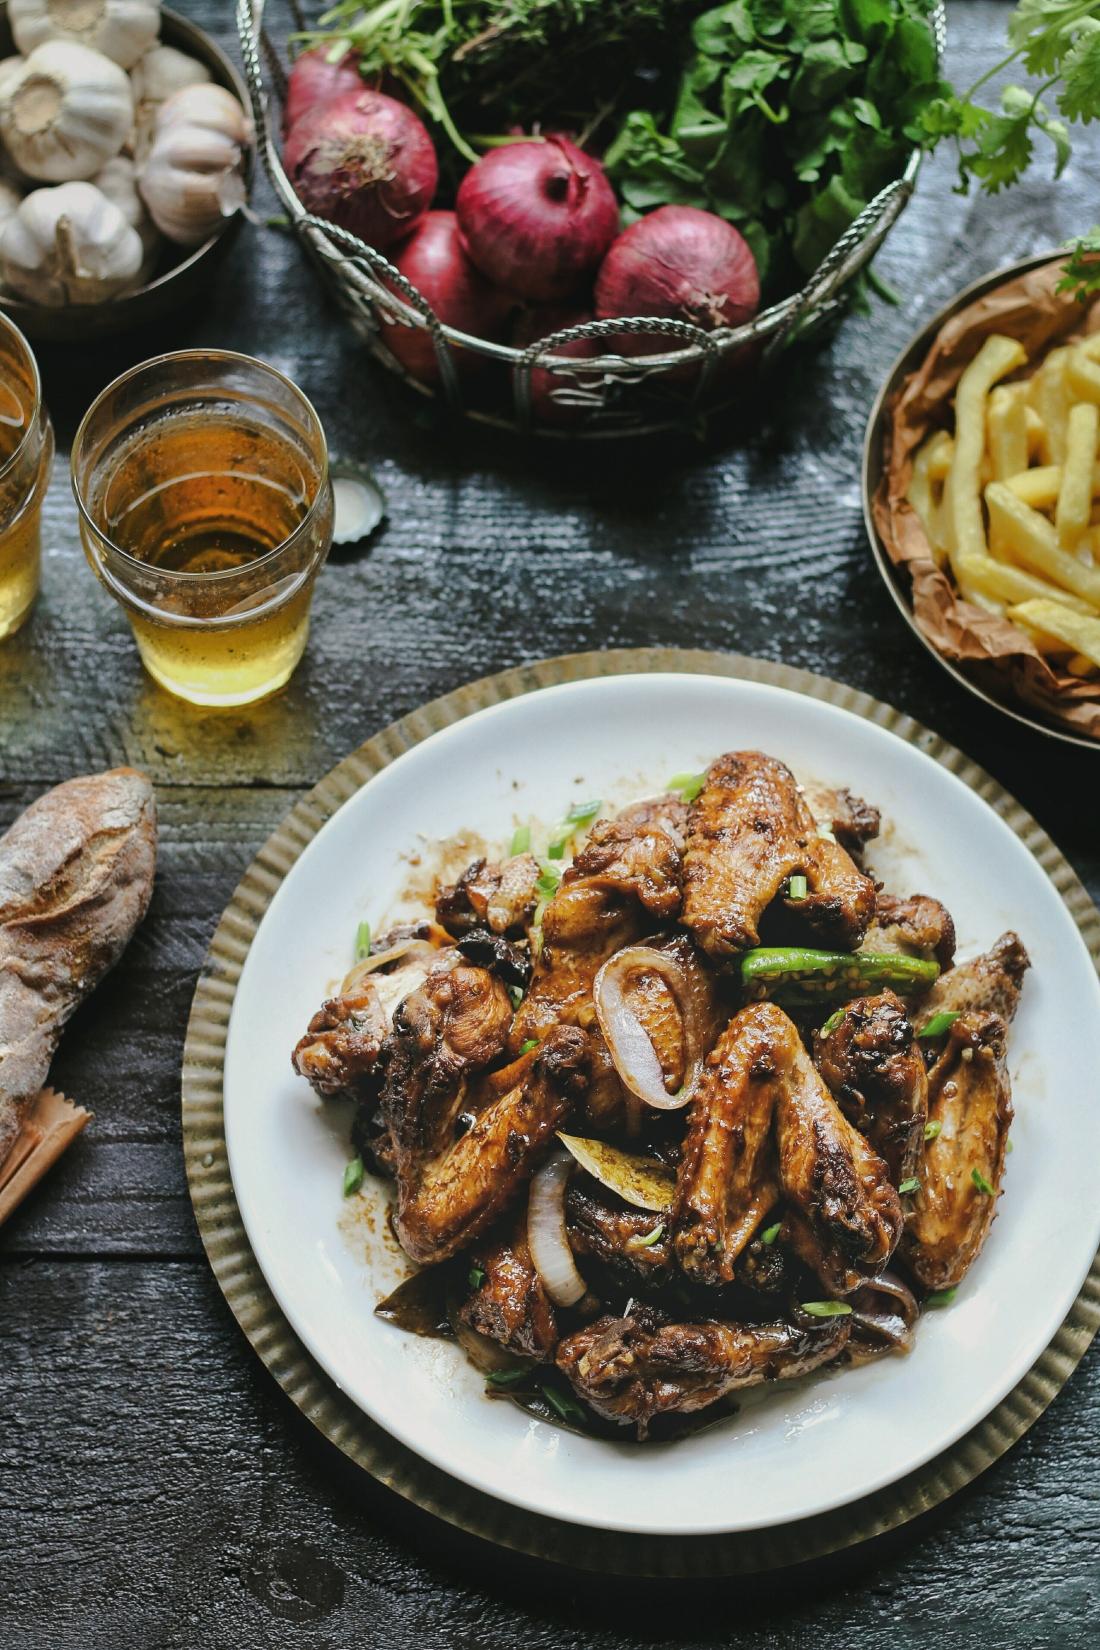 poulet-frite-finish